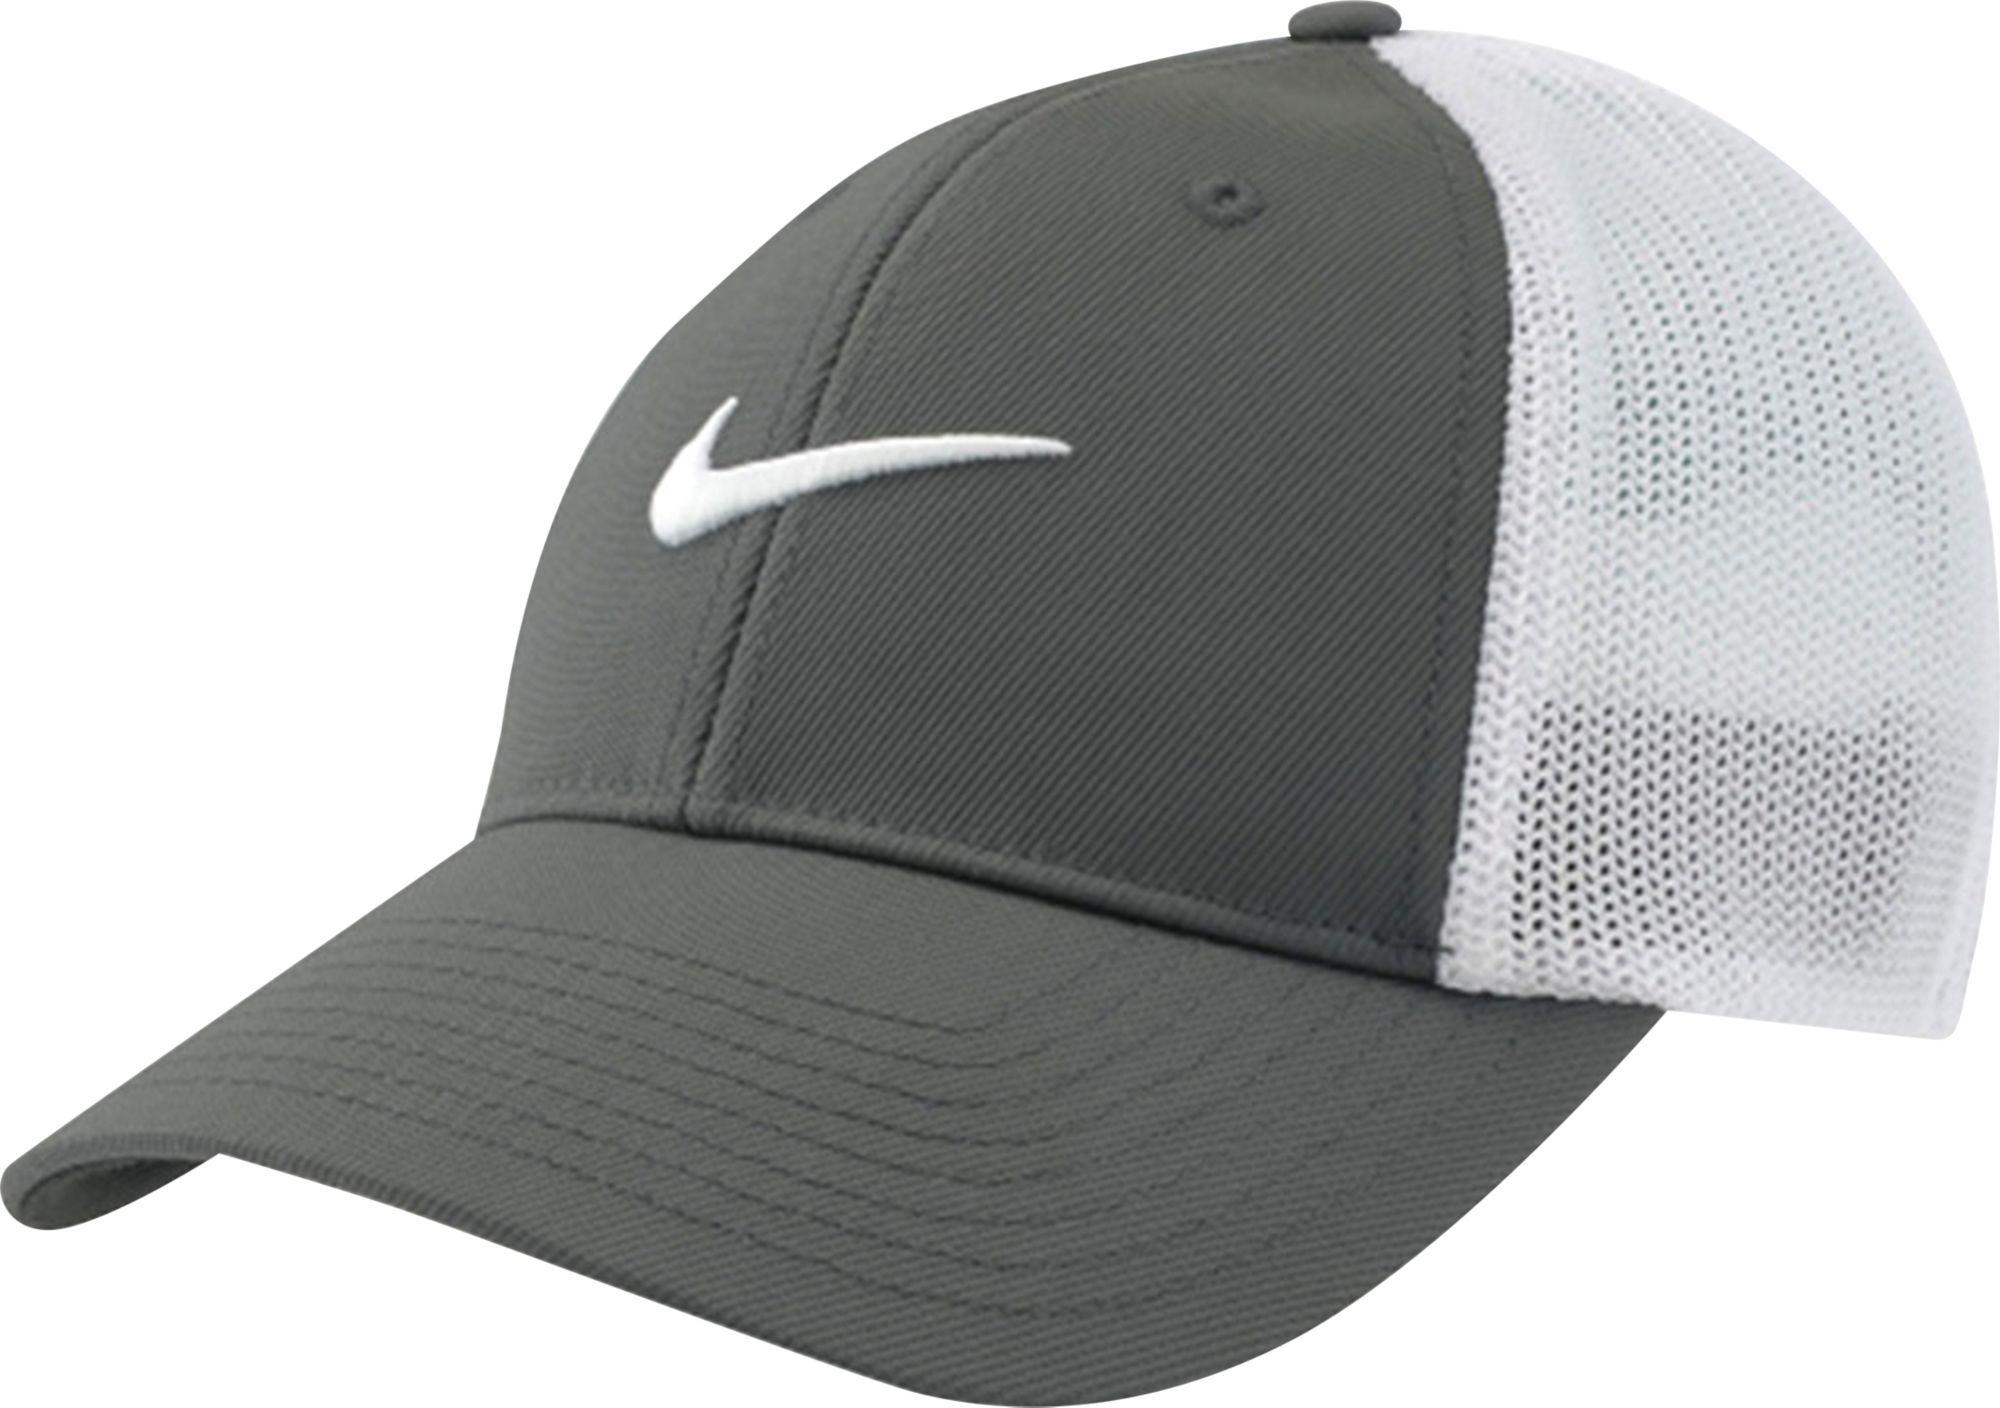 13d3875015680 Nike Flex Fit Hat   Products   Flex fit hats, Hats, Baseball hats